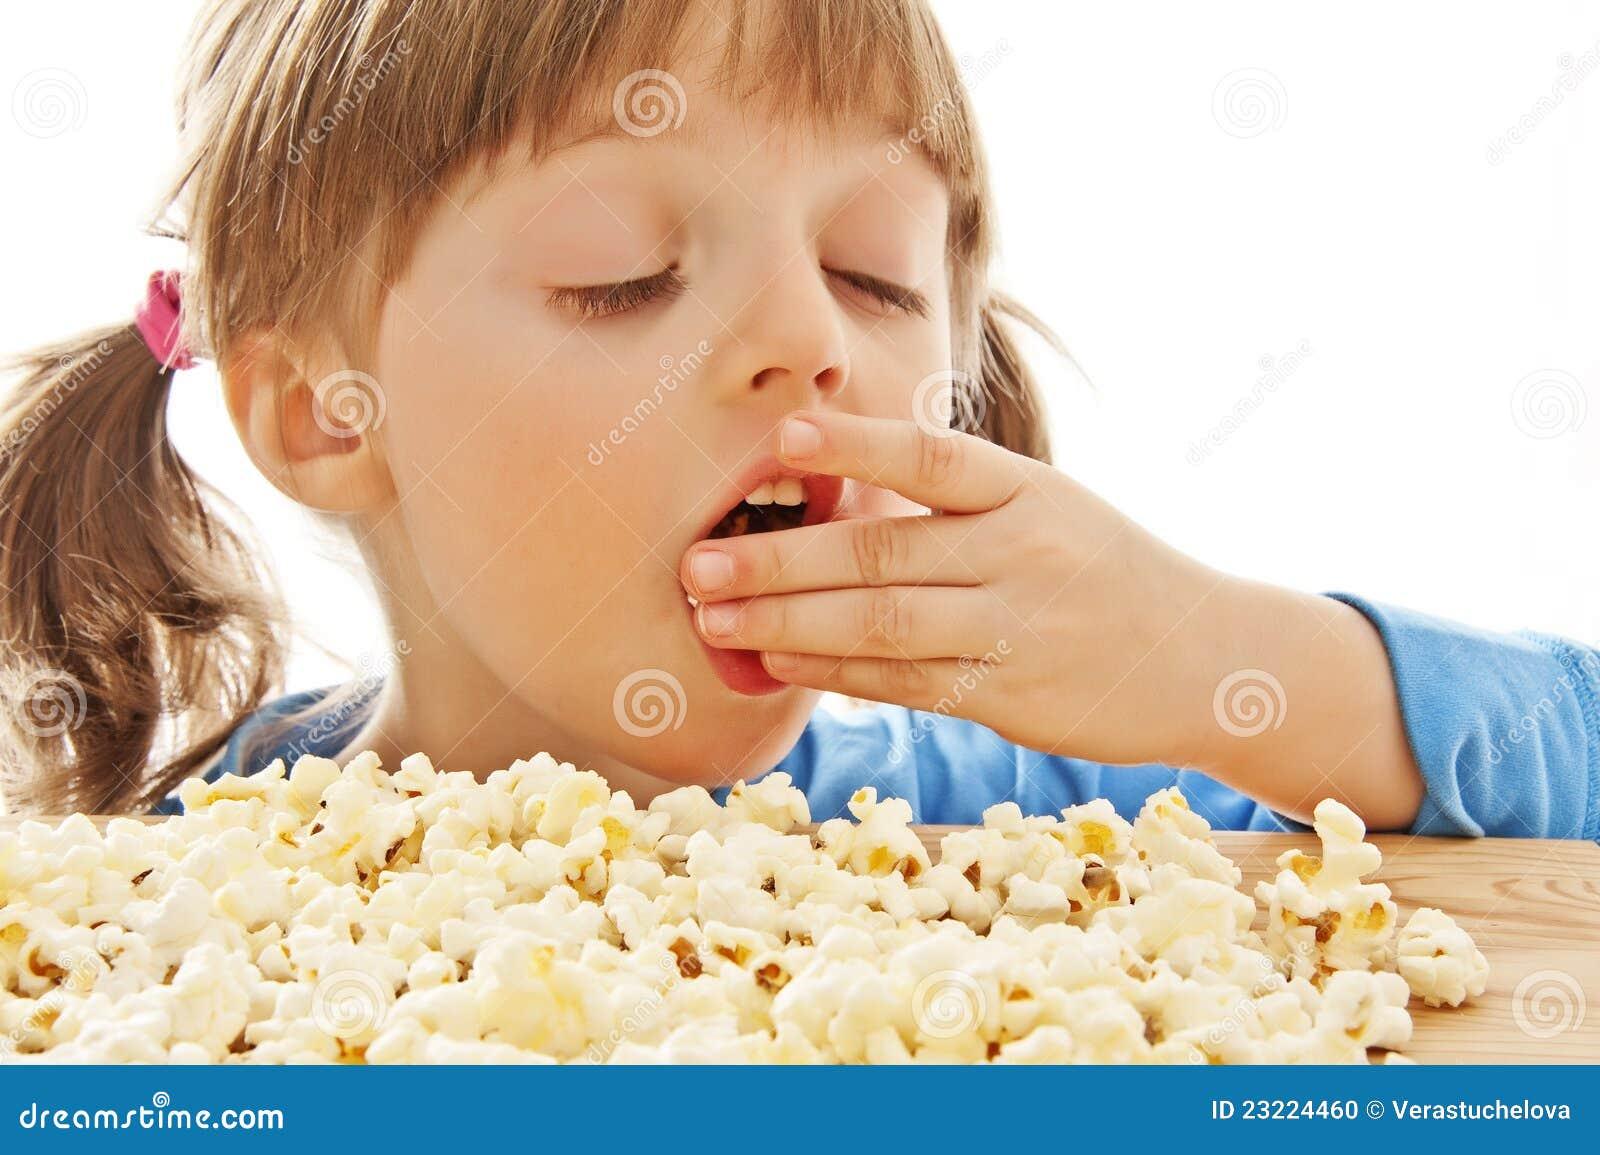 Fat Kid Eating Popcorn